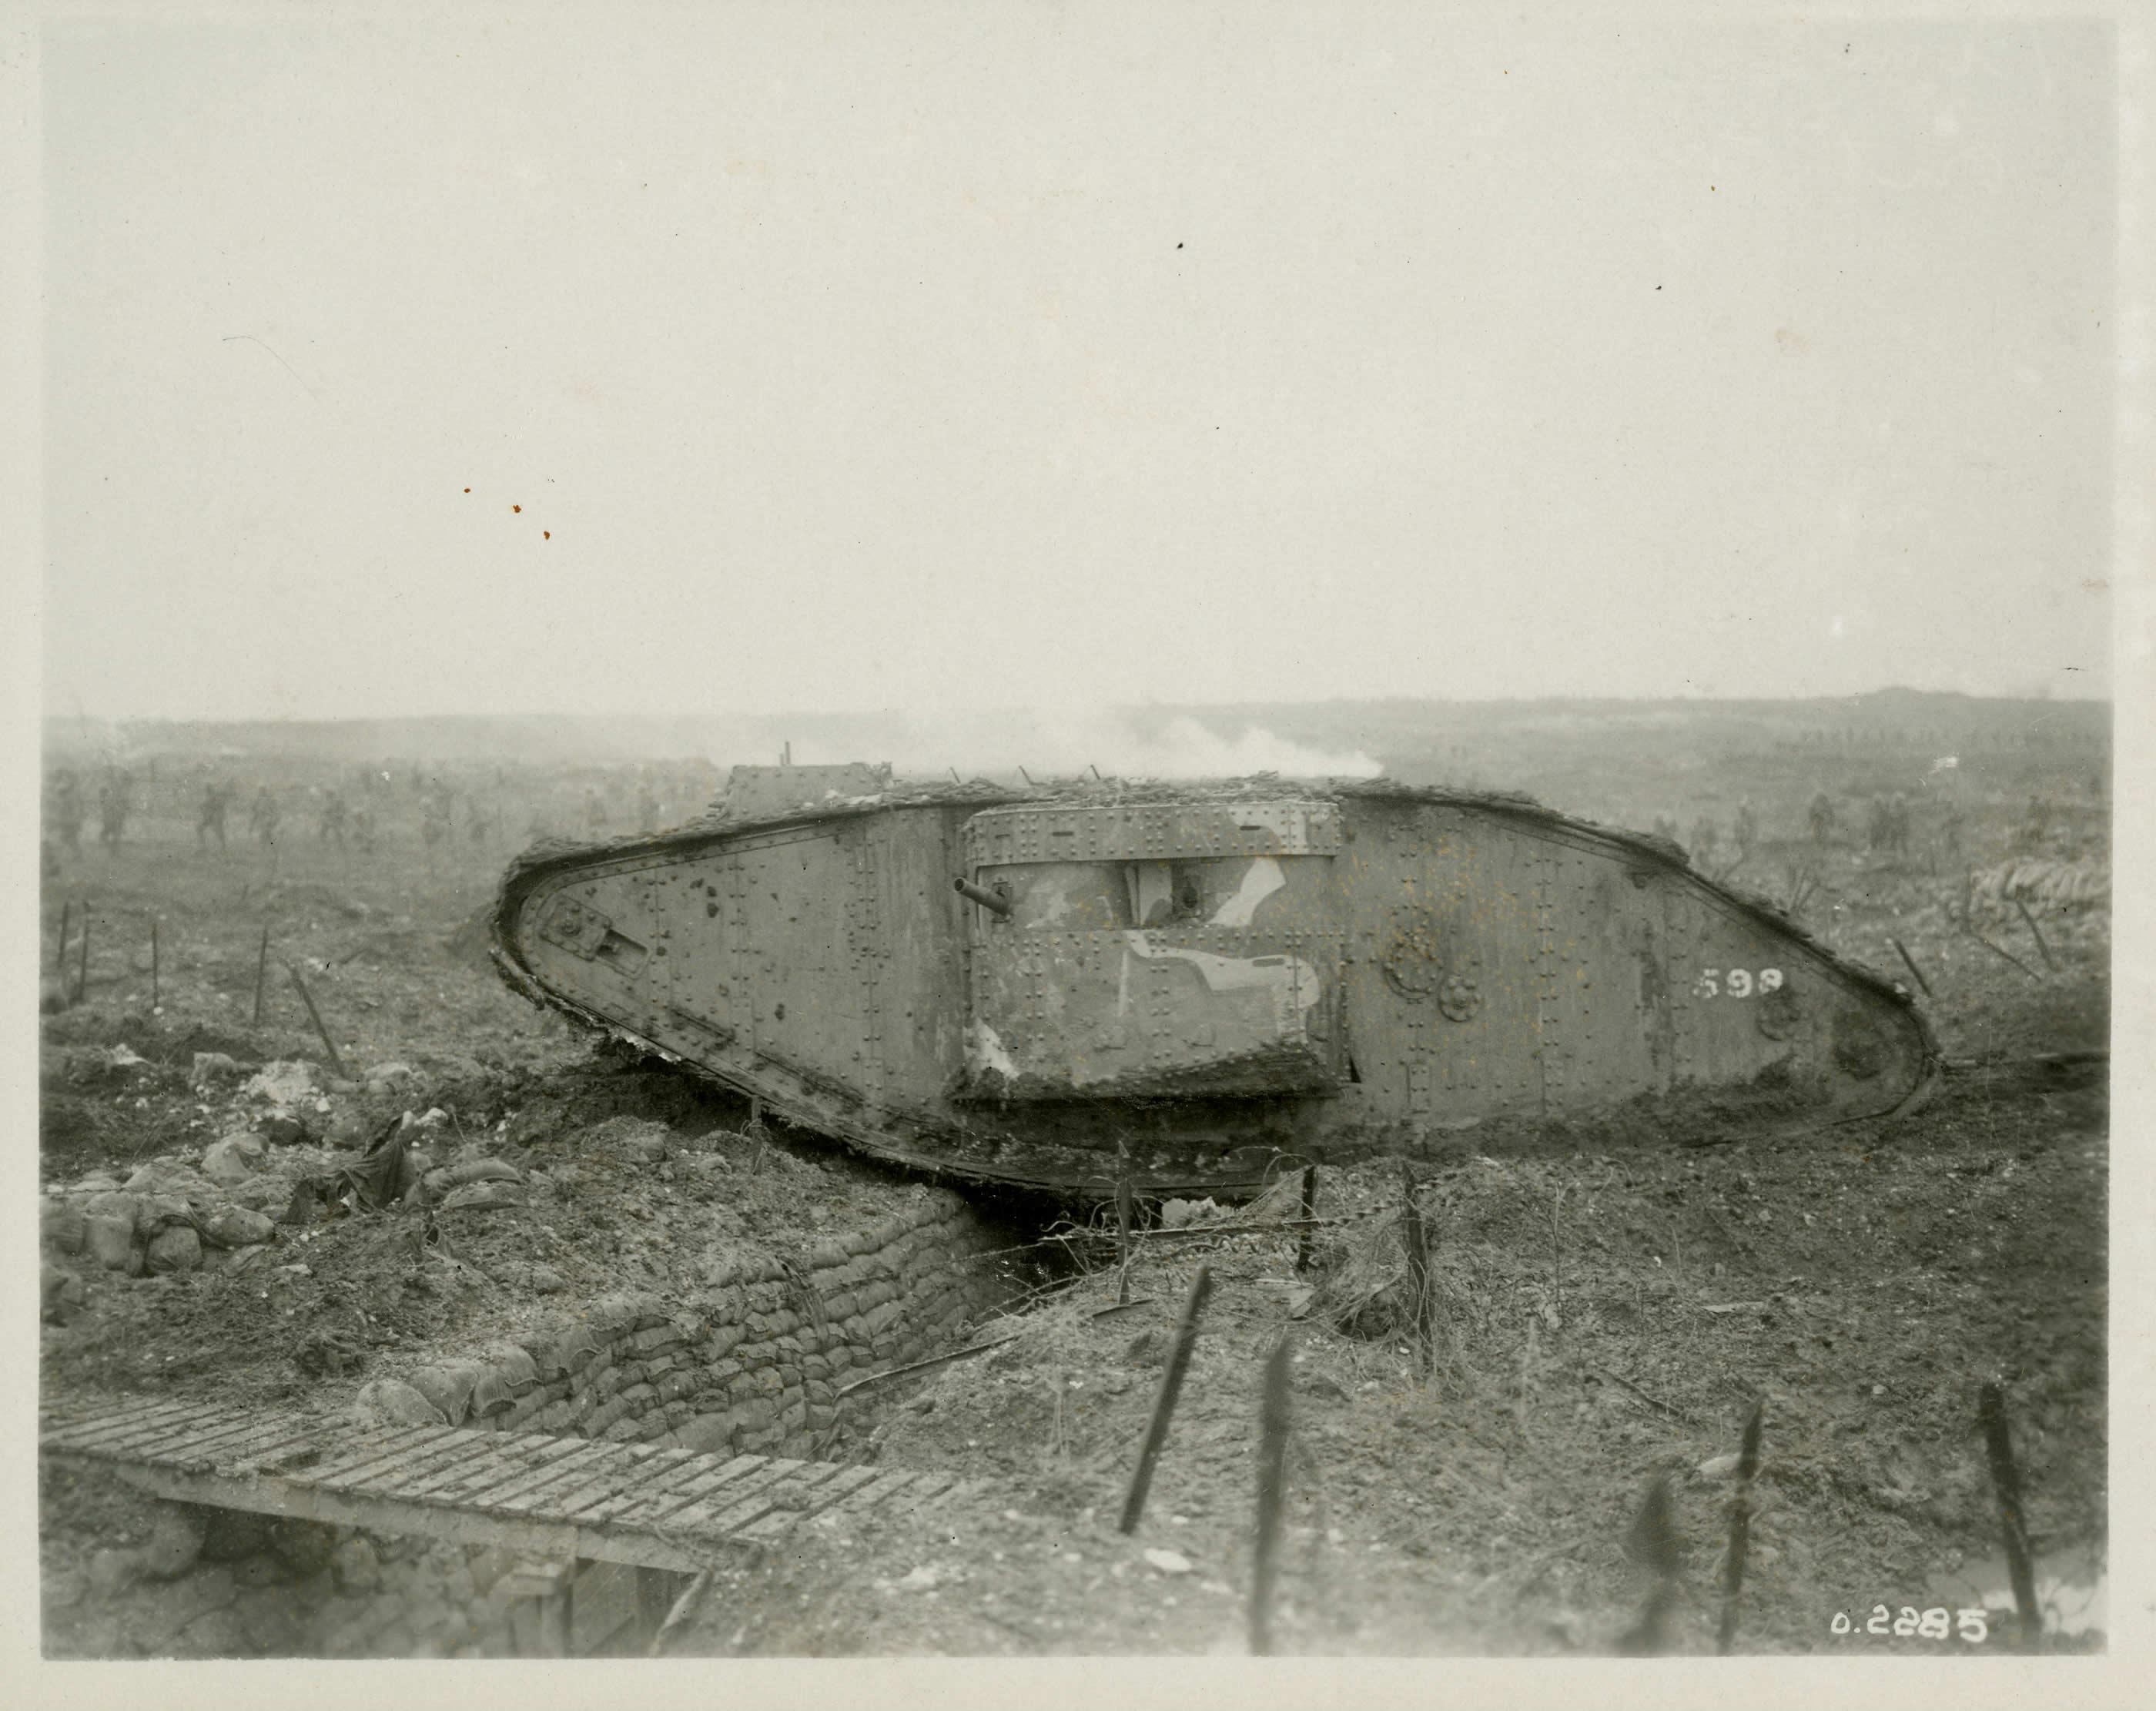 Tank at Vimy